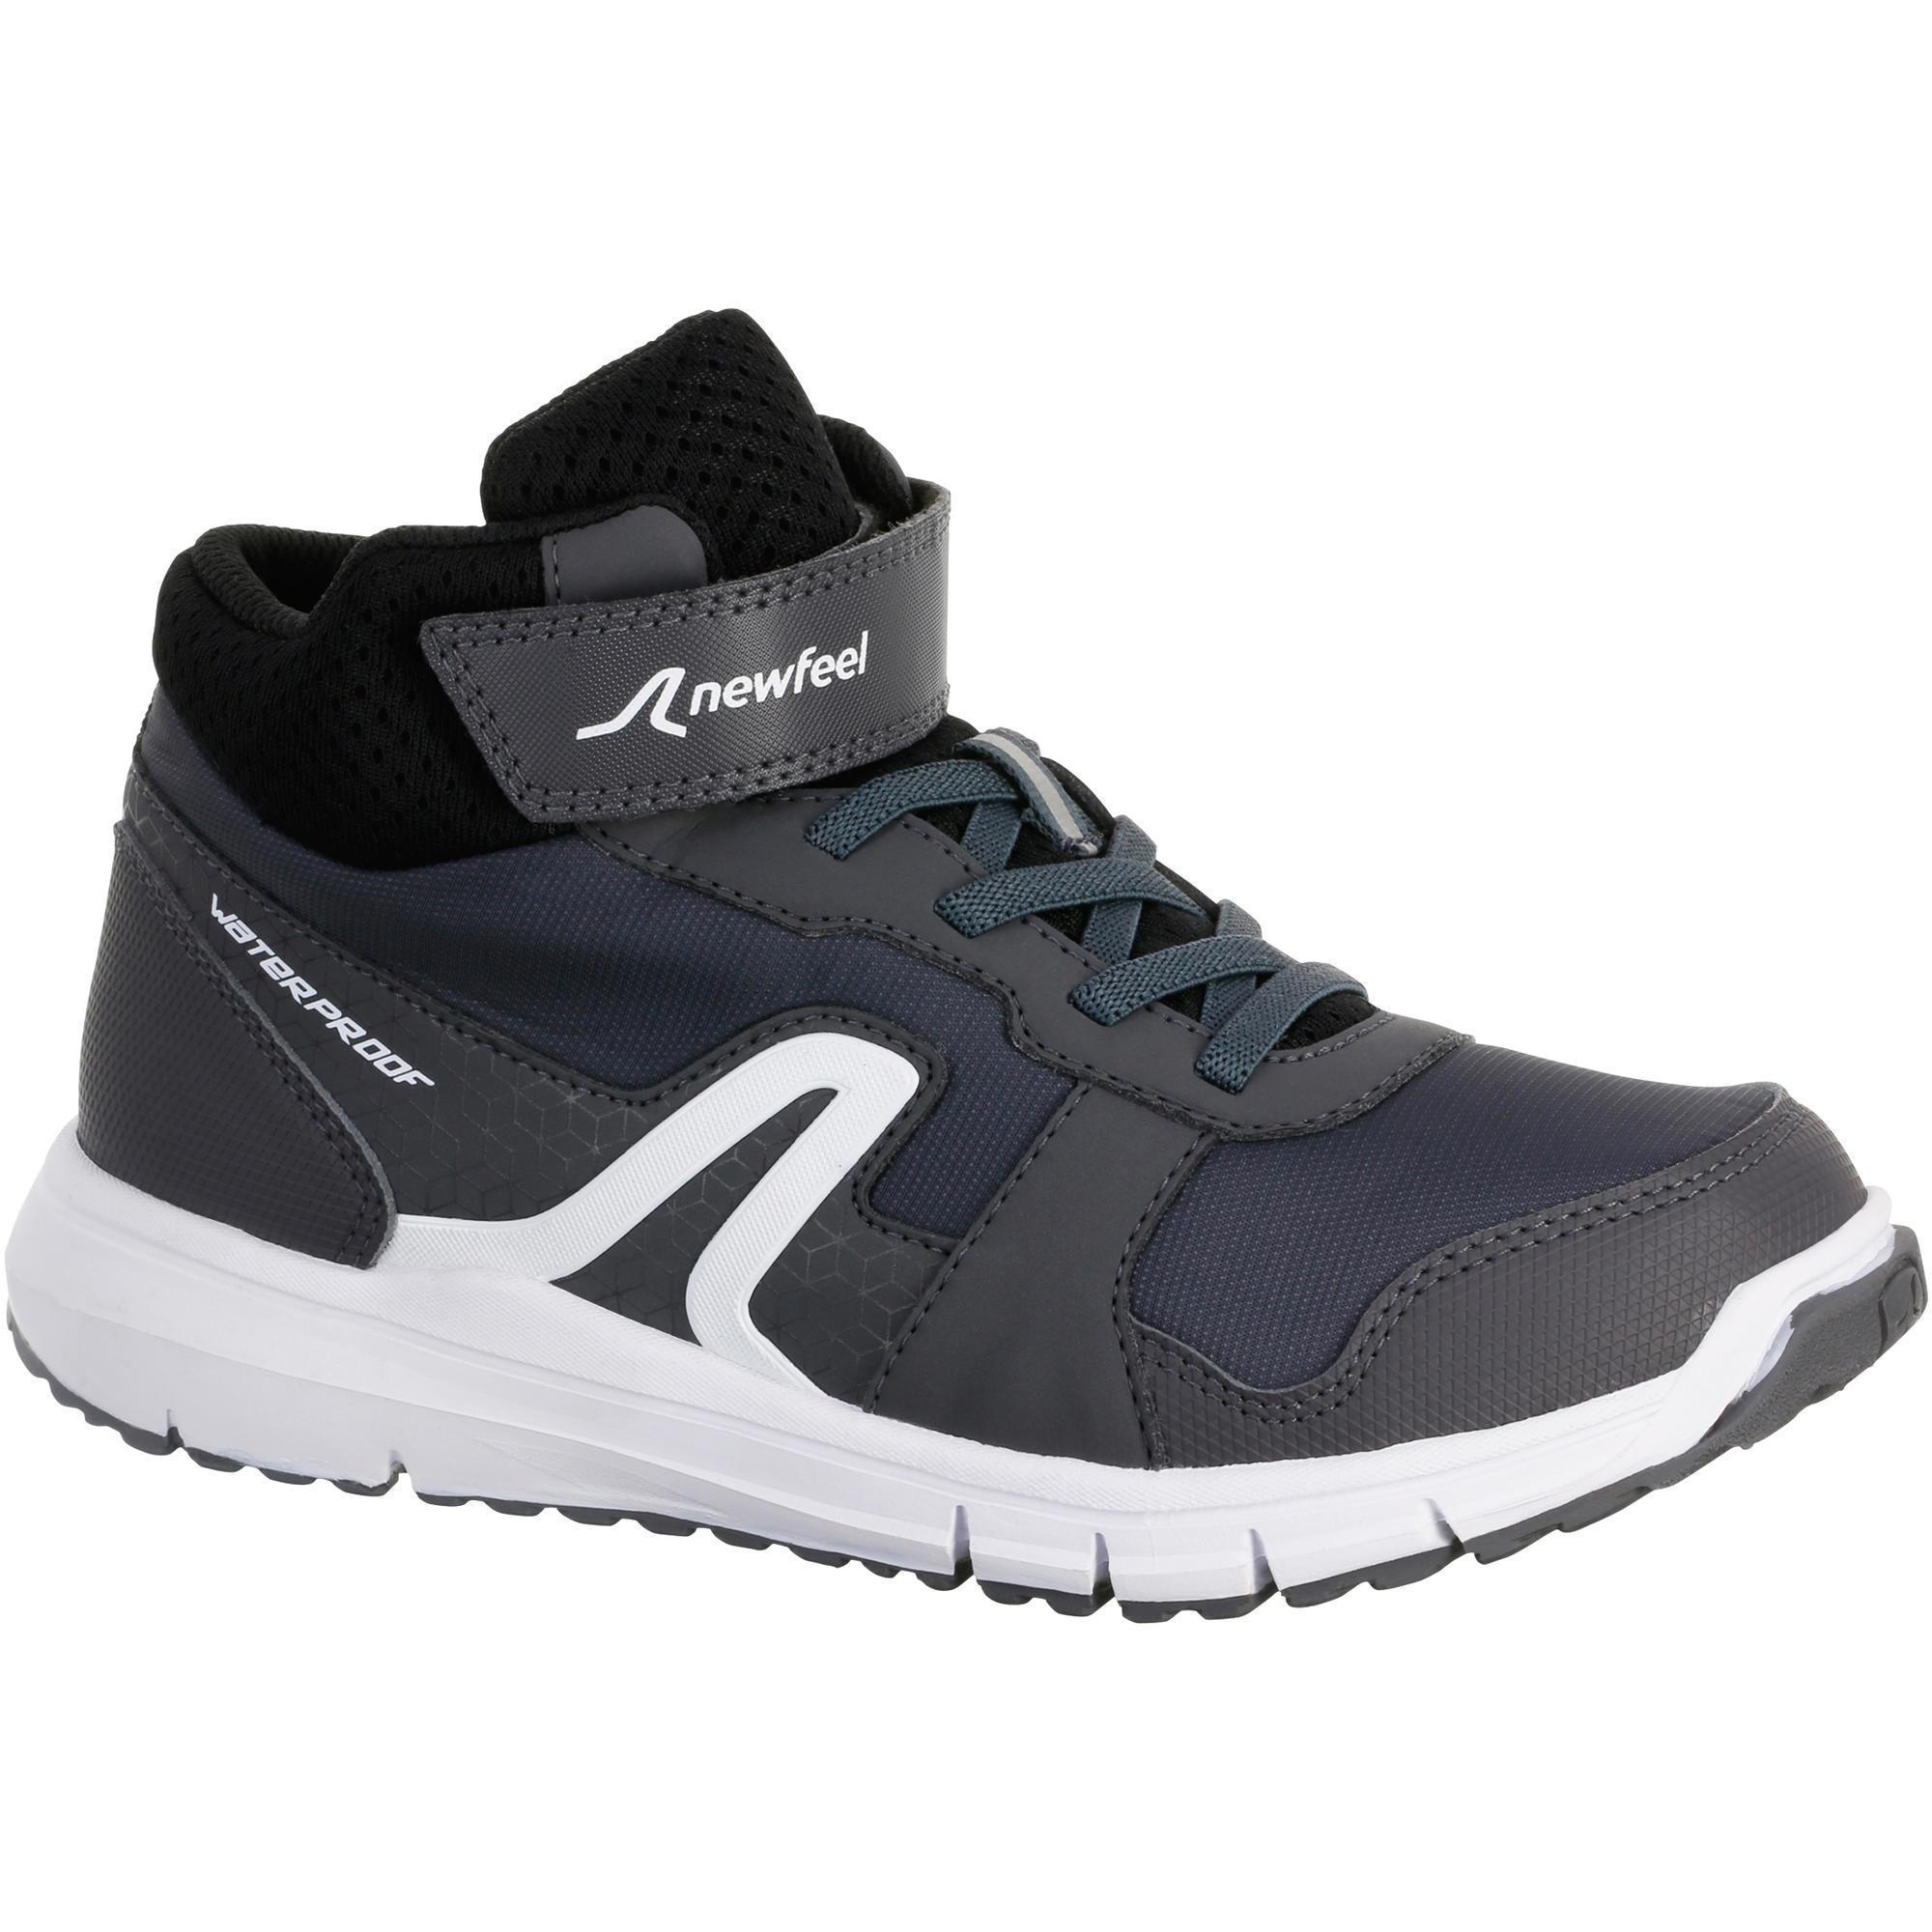 Protect 580 Kids' Walking Waterproof Shoes grey/white